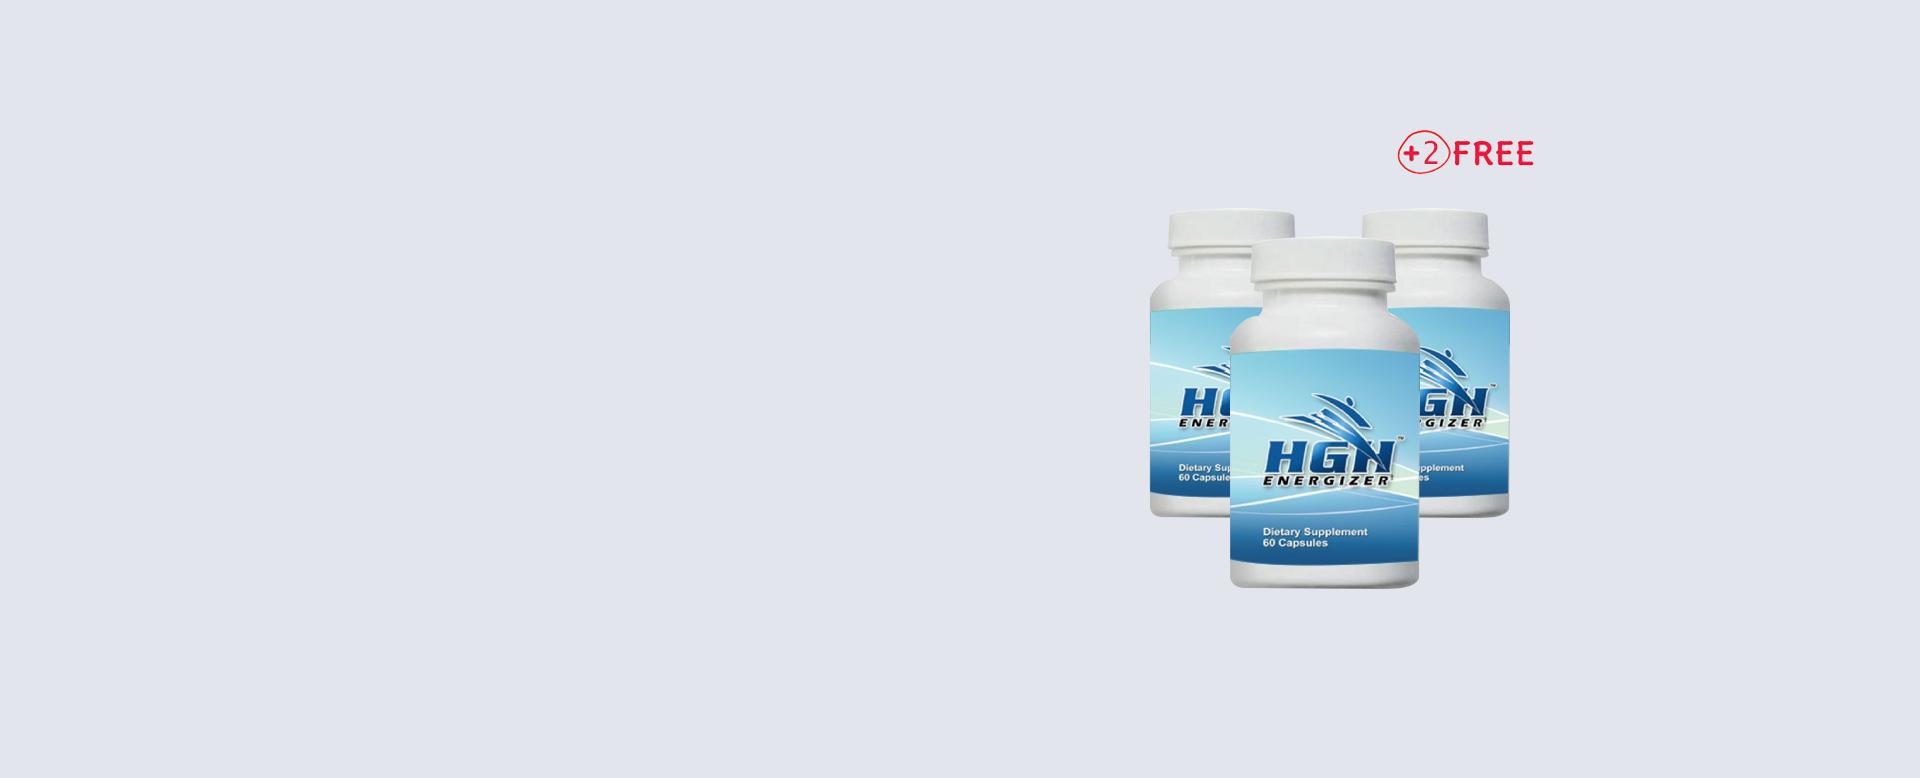 hgh-energizer-banner